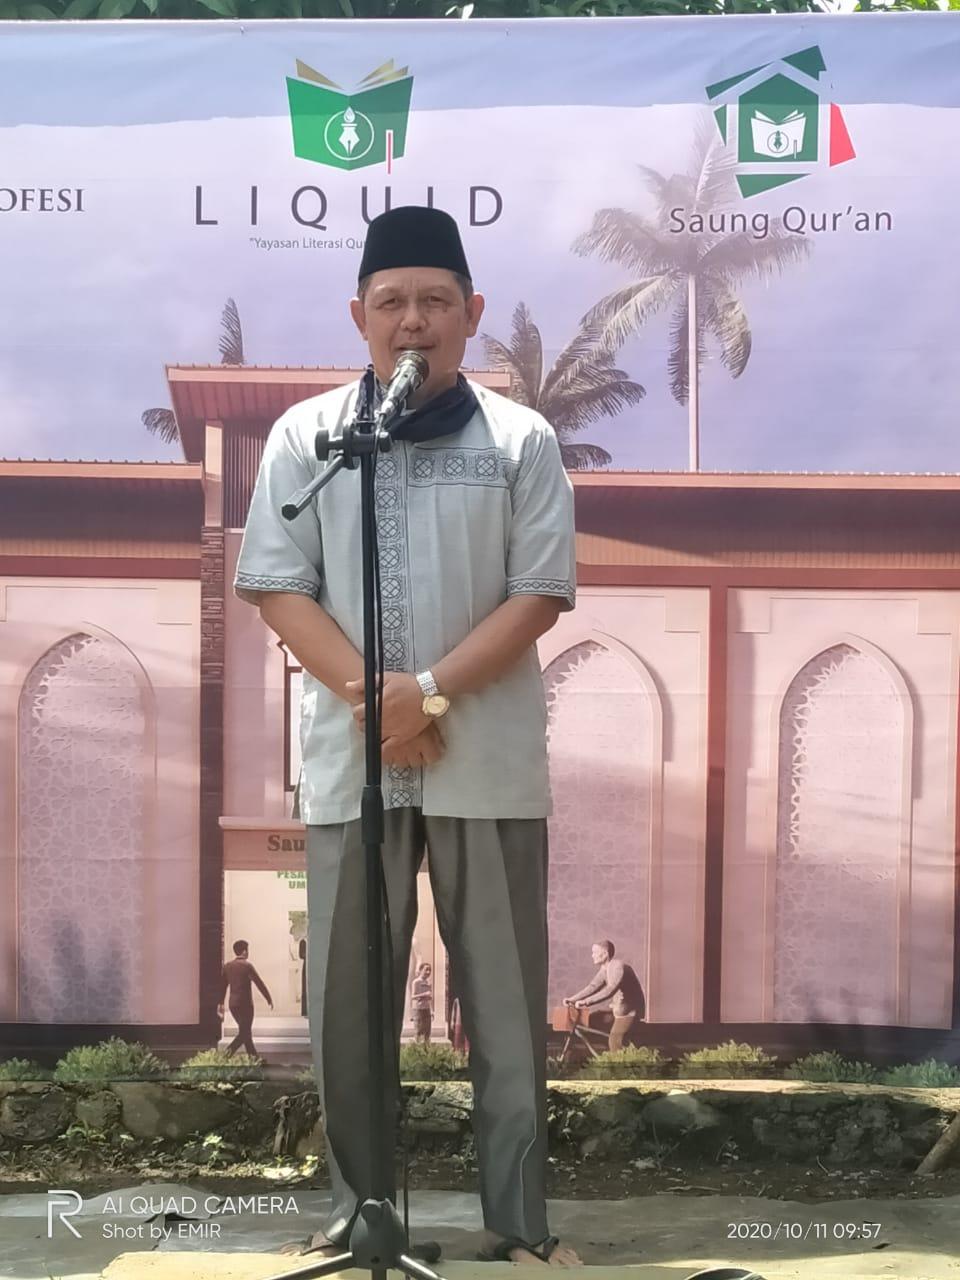 Yayasan Literasi Quran Indonesia LIQUID